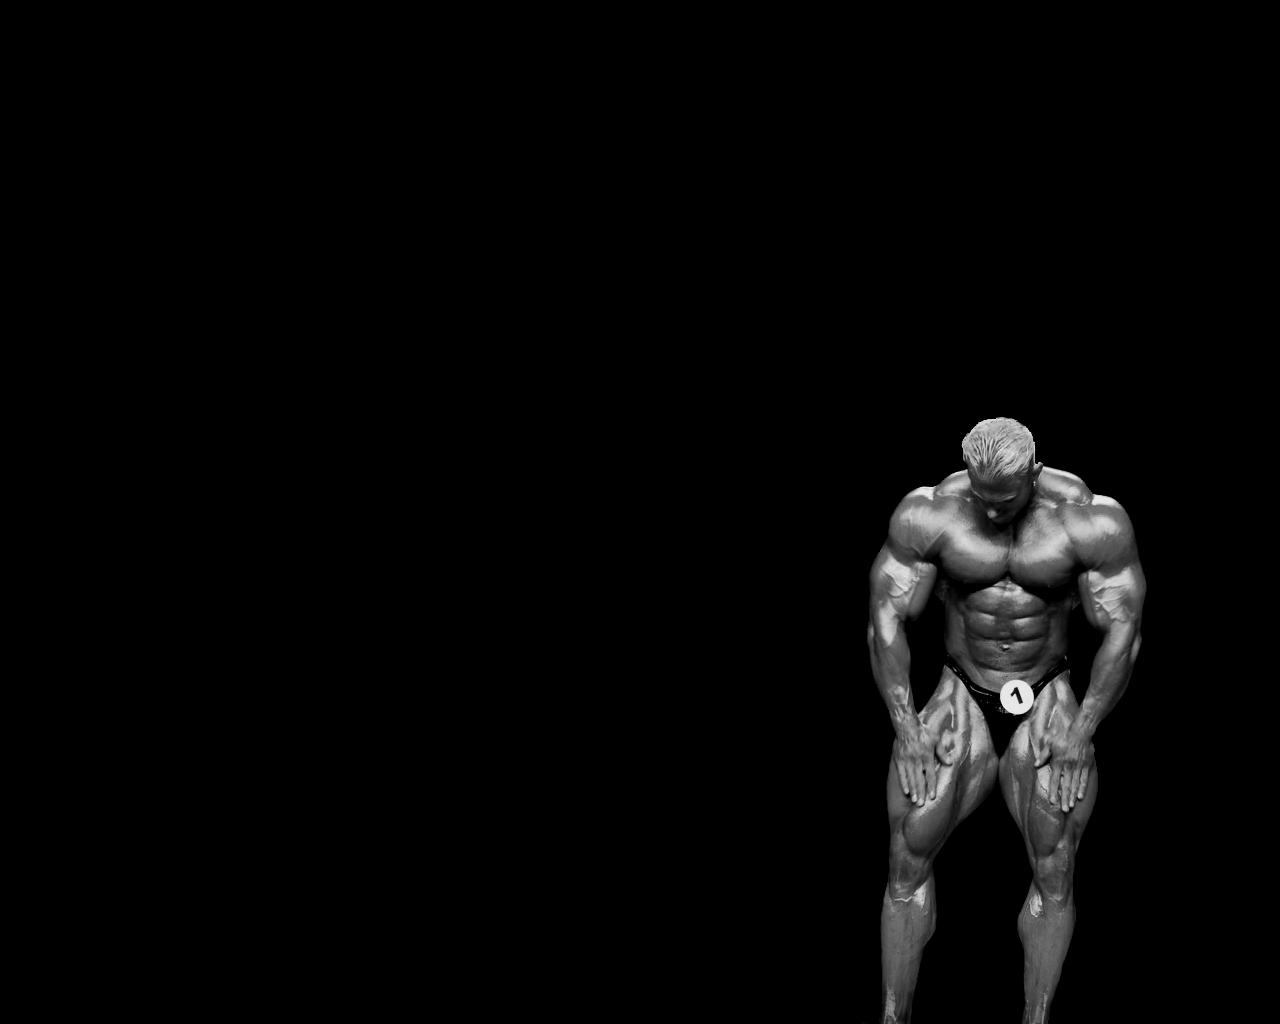 motivational bodybuilding desktop - photo #34